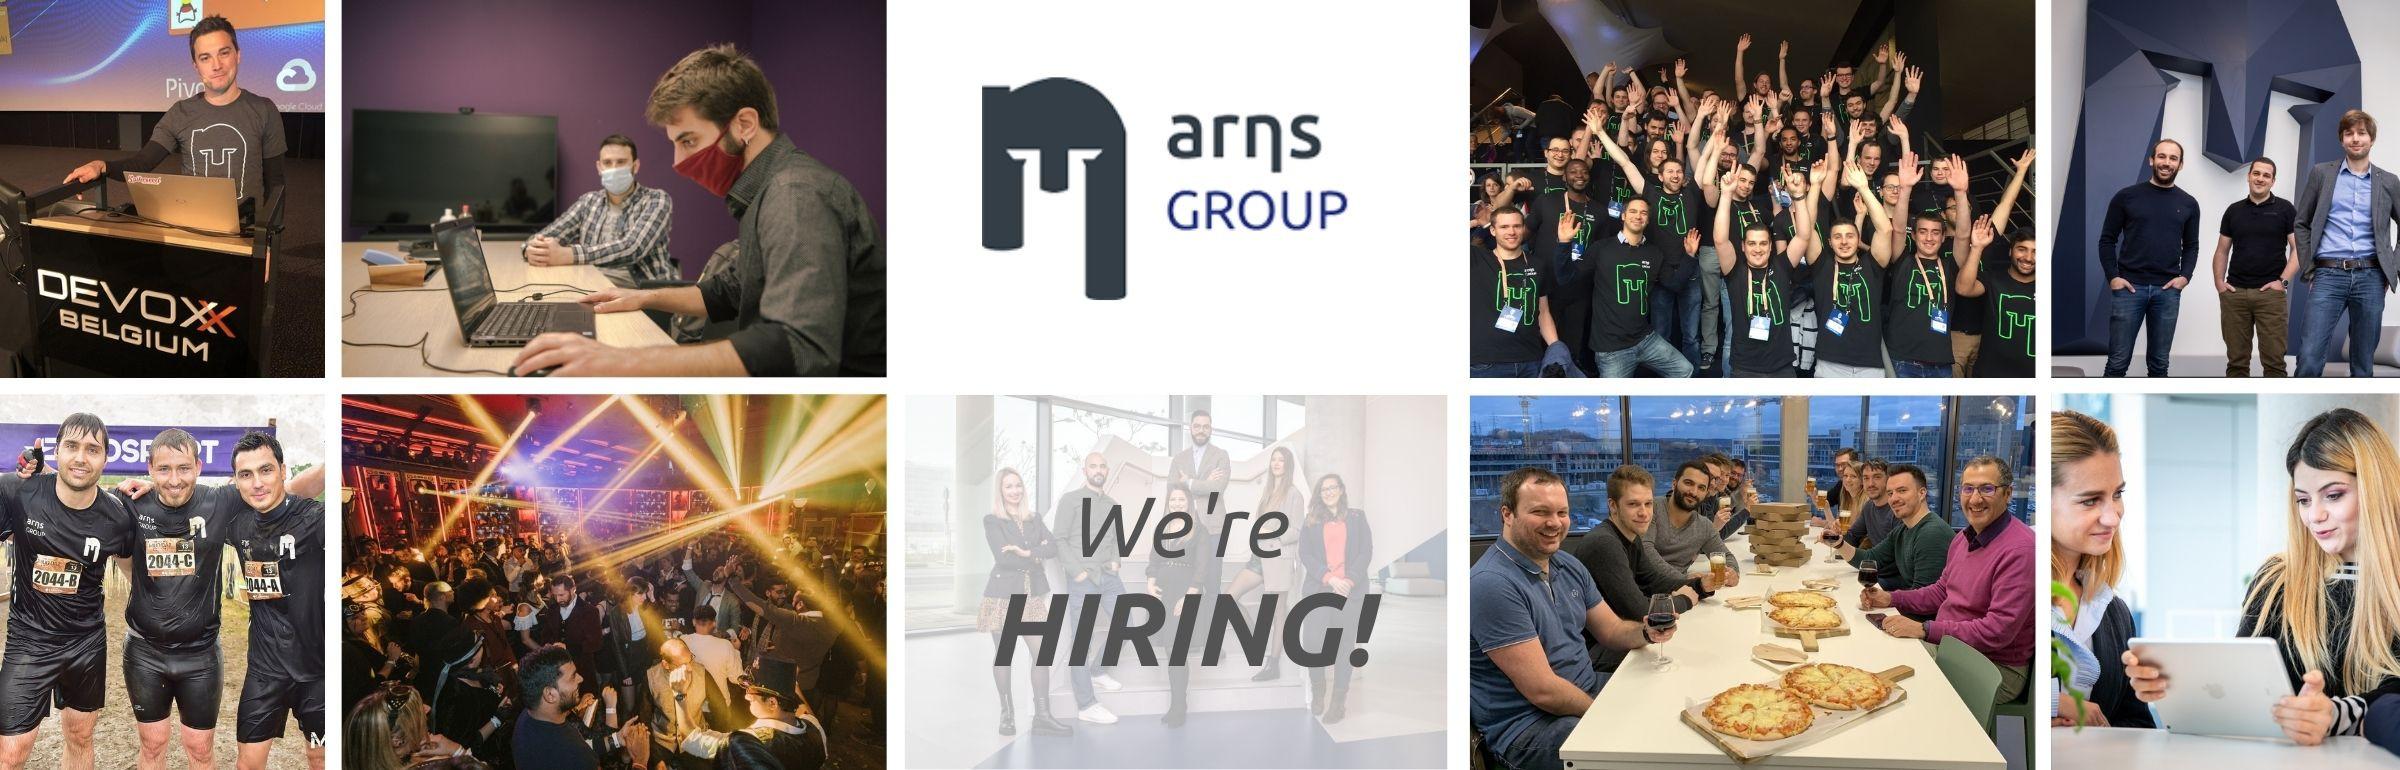 Banner ARHS Group